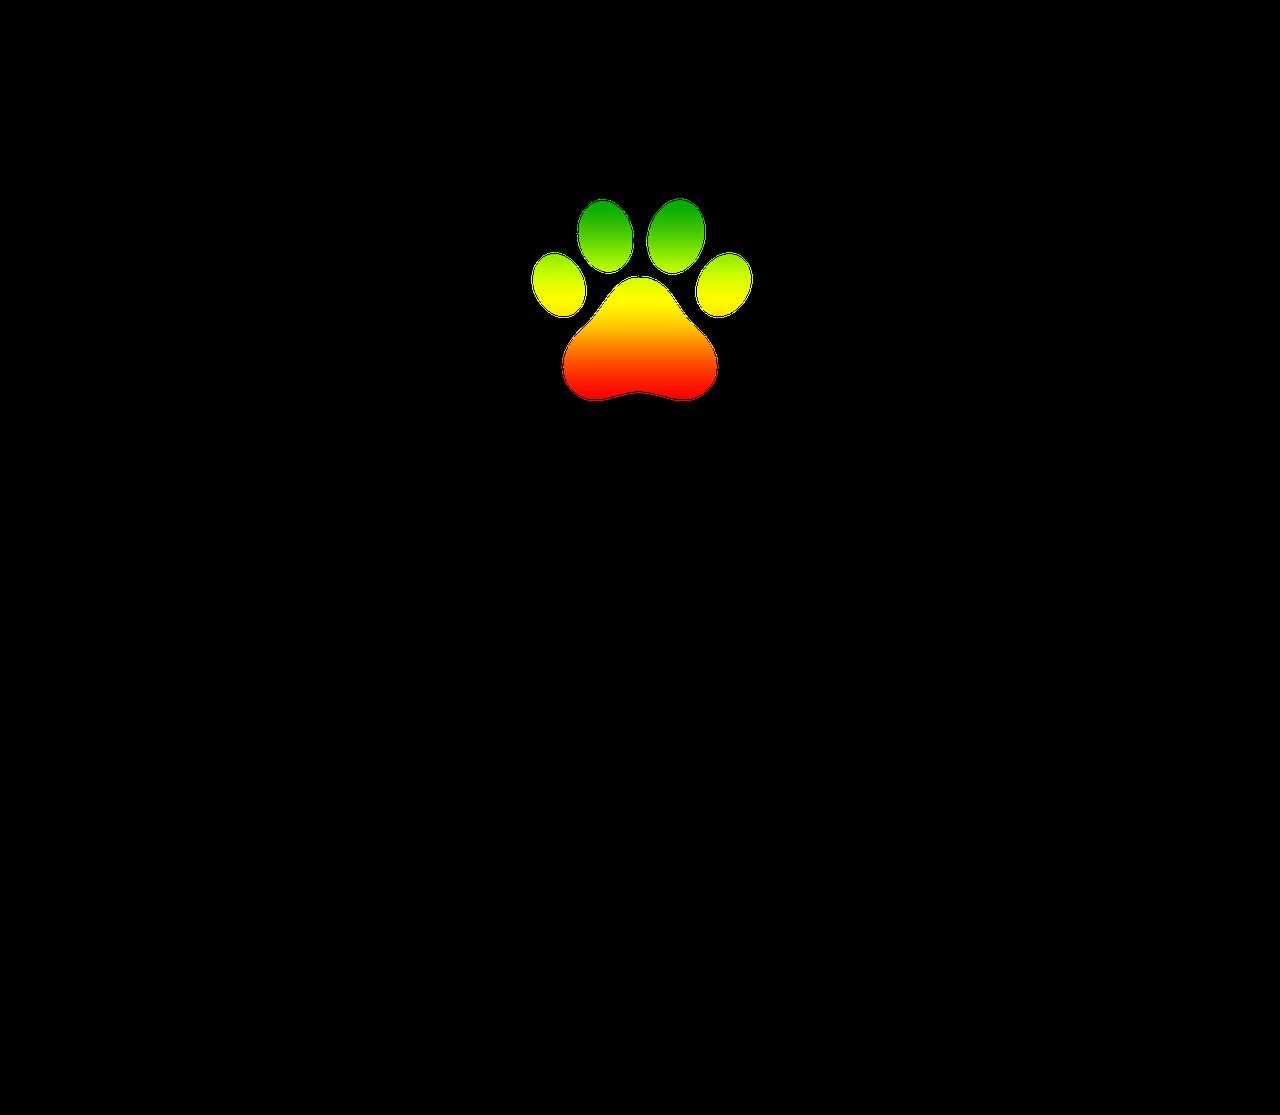 a35a32d0-e164-11e9-8f88-0242ac110002-wonders-logo-png.png